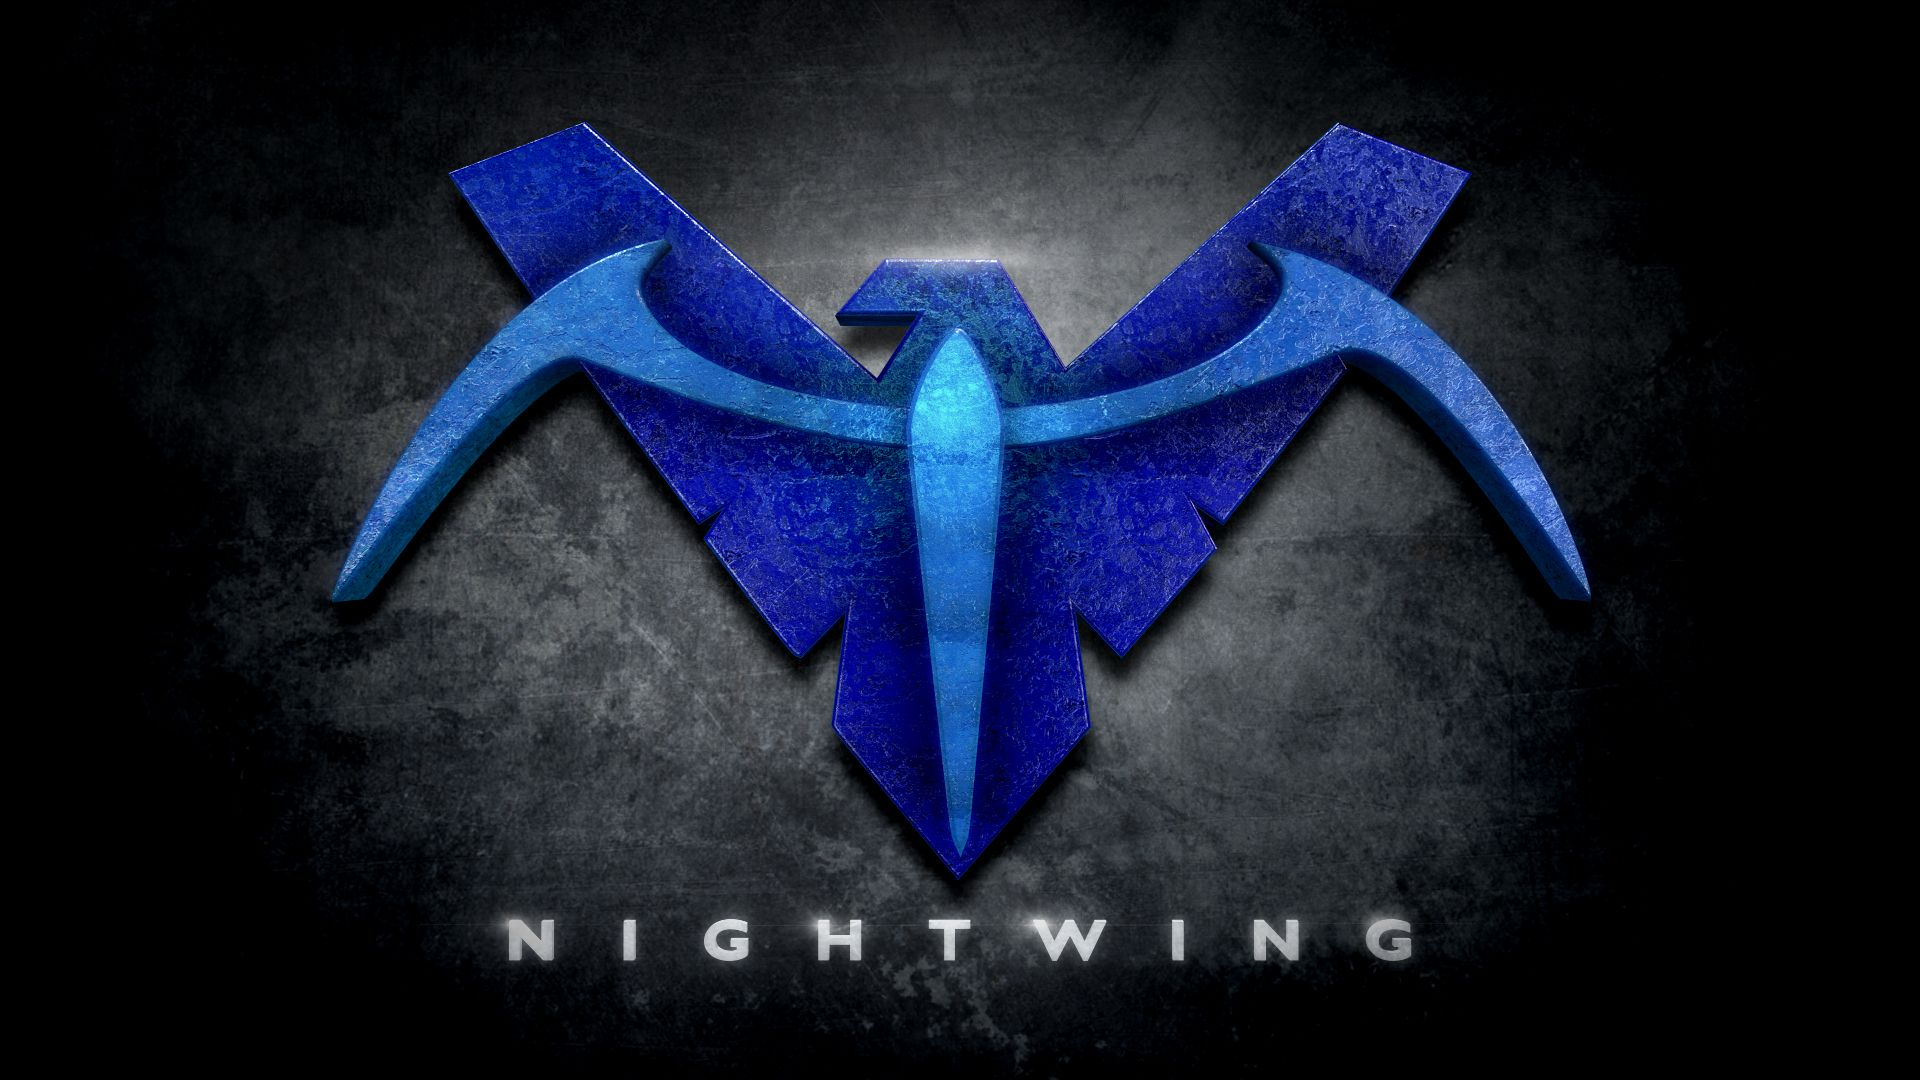 Nightwing In The Style Of Man Of Steel Http Www Redbubble Com People Bigrockdj Works 11344192 Nightwi Nightwing Dc Comics Logo Batman Superman Wonder Woman